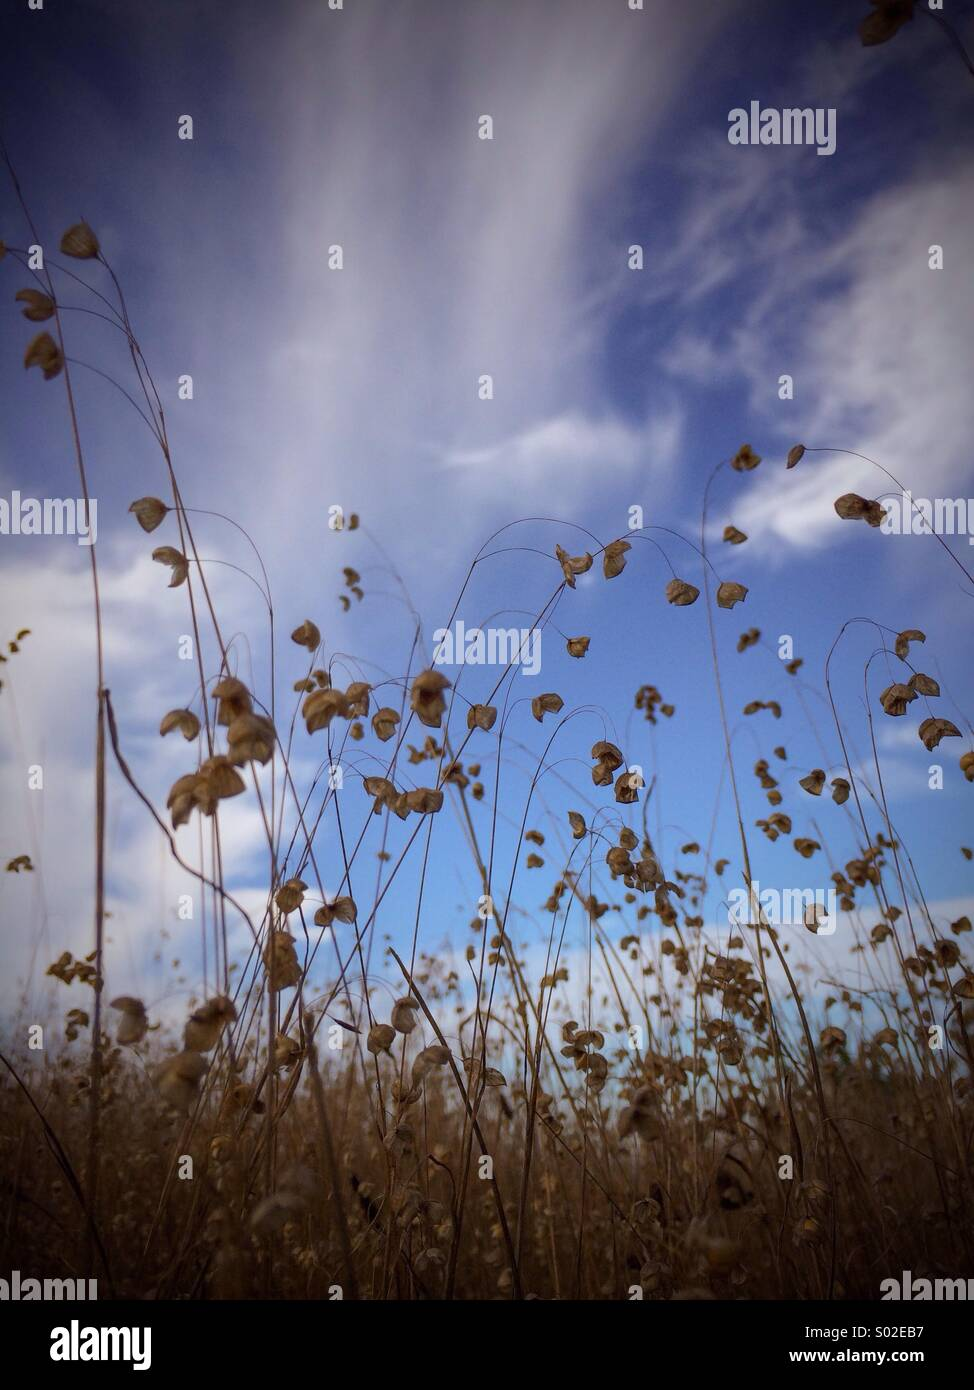 Grassy field - Stock Image